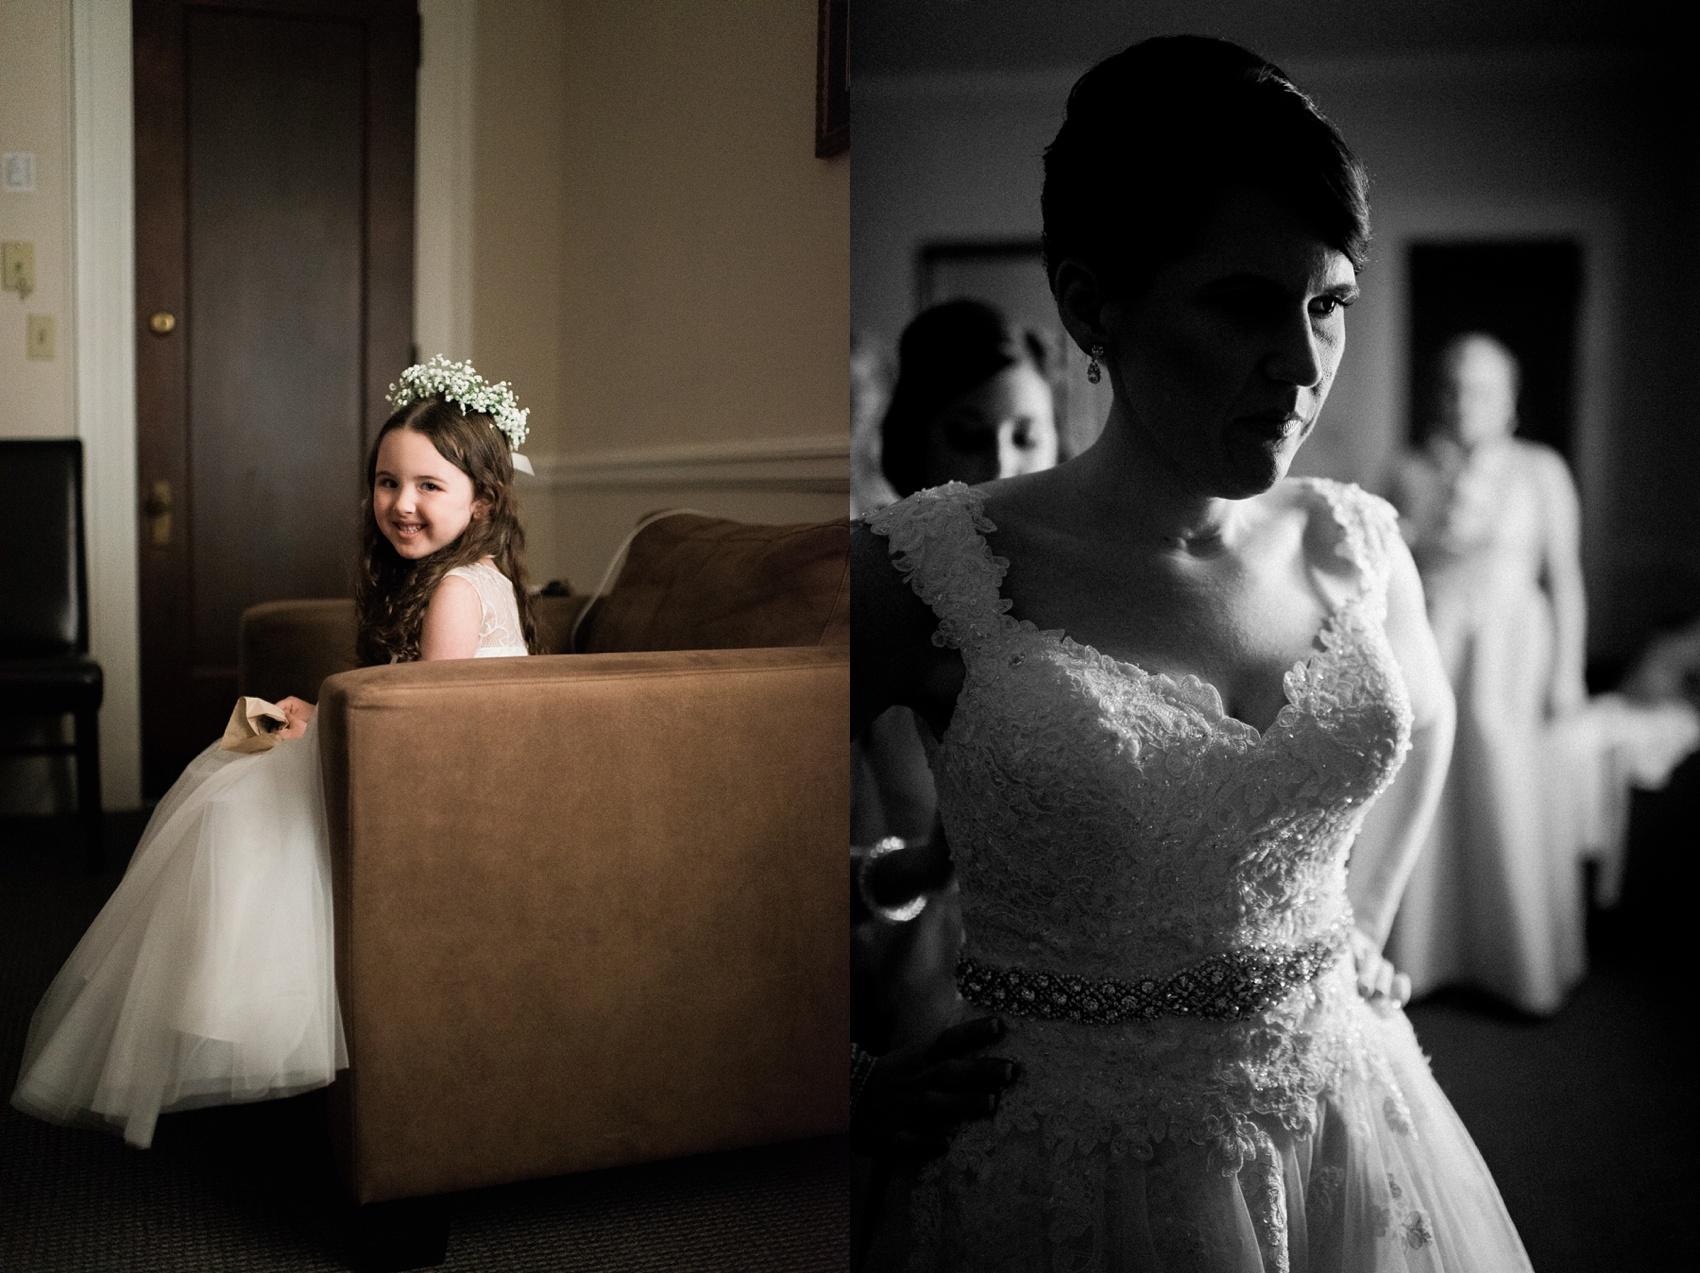 augusta_wedding_photographer_0011.jpg